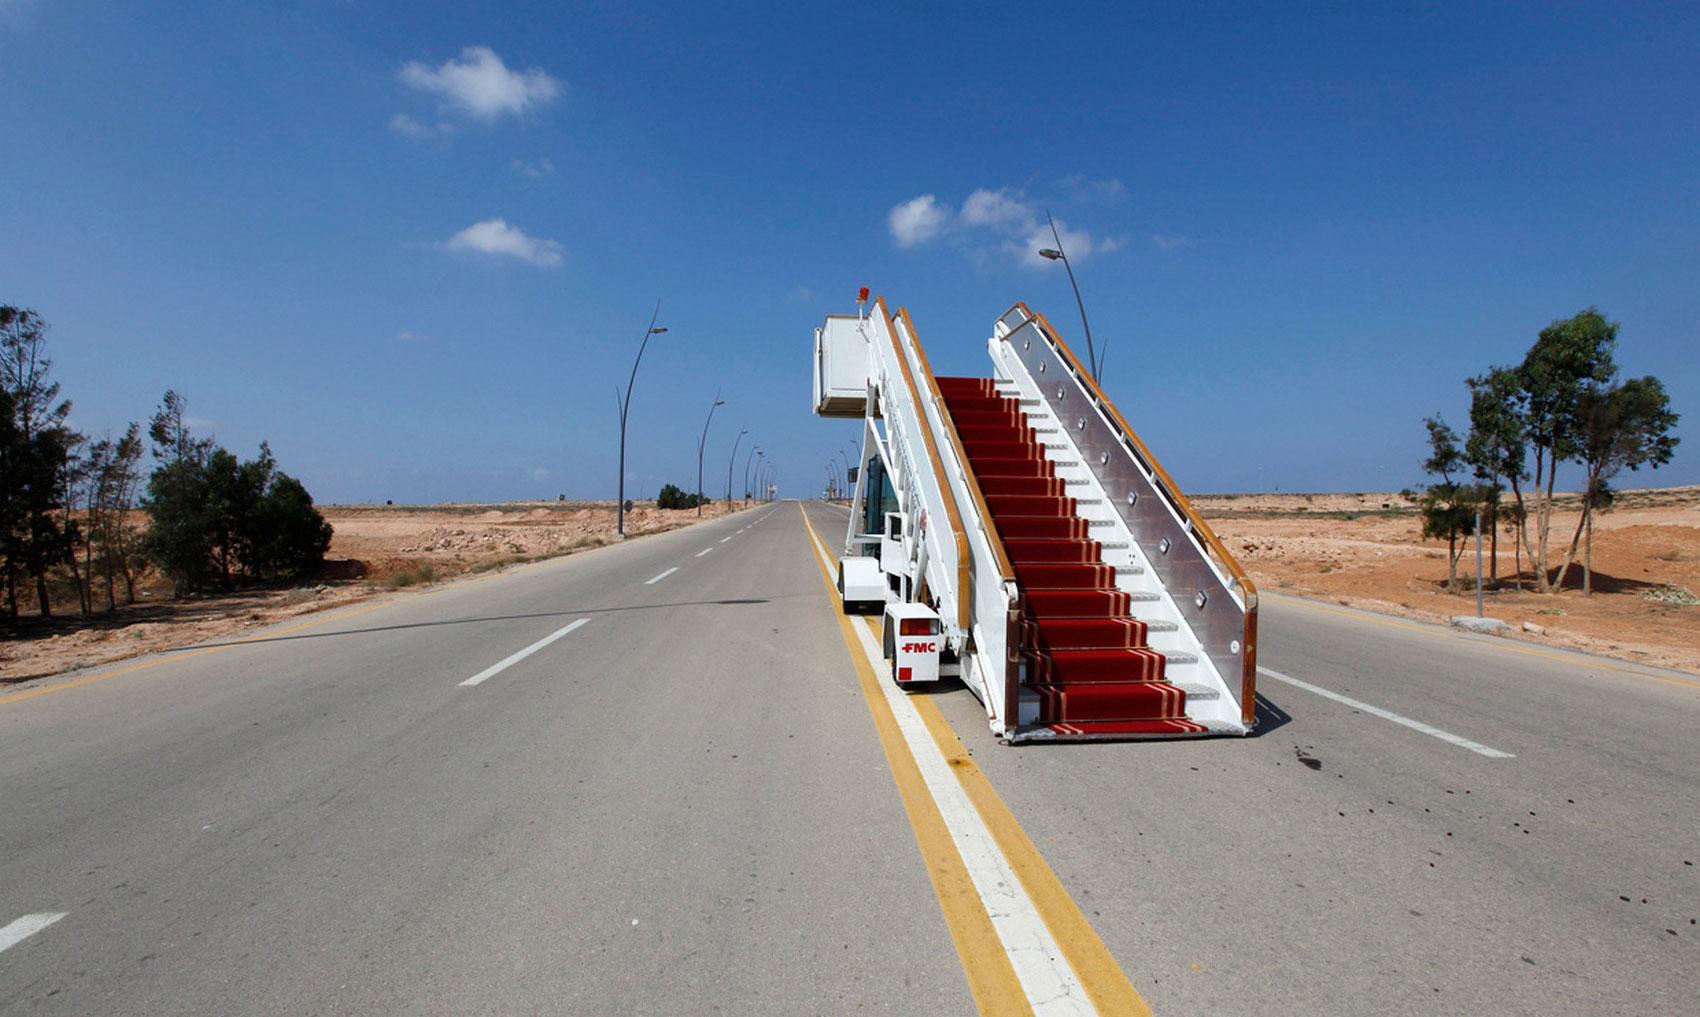 трап на дороге возле аэропорта, фото